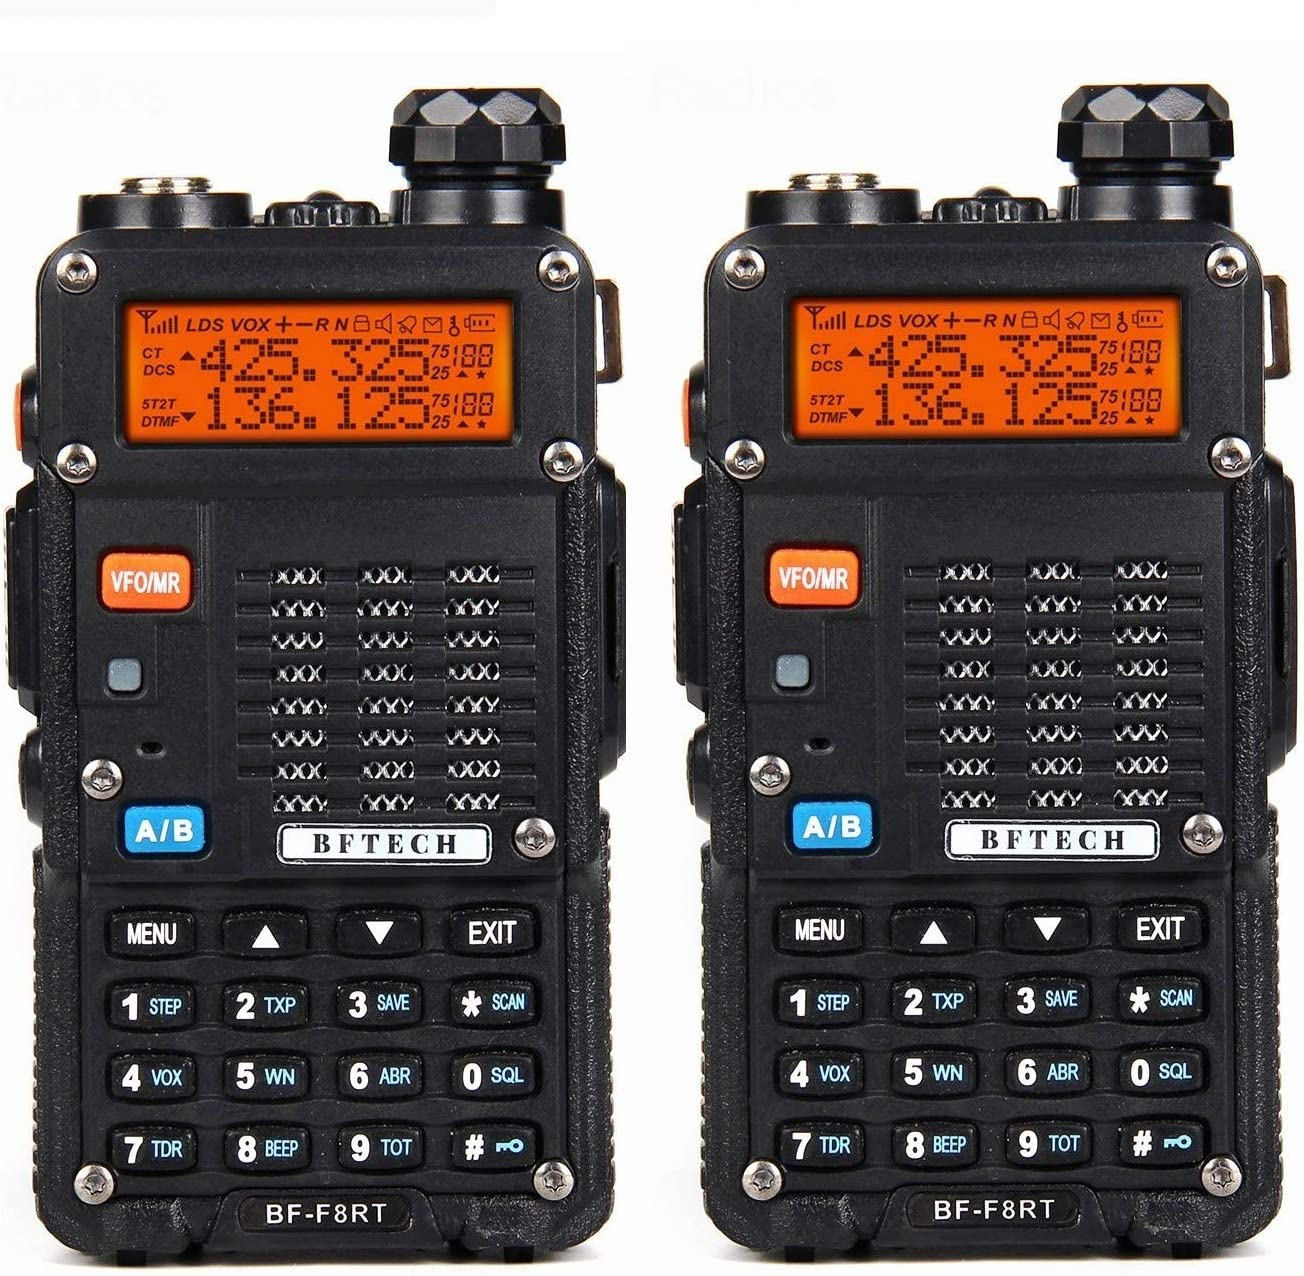 BFTECH BF-F8RT BF-F8 3rd Gen 8-Watt Dual Band Two-Way Radio 136-174Mhz VHF 400-520Mhz UHF